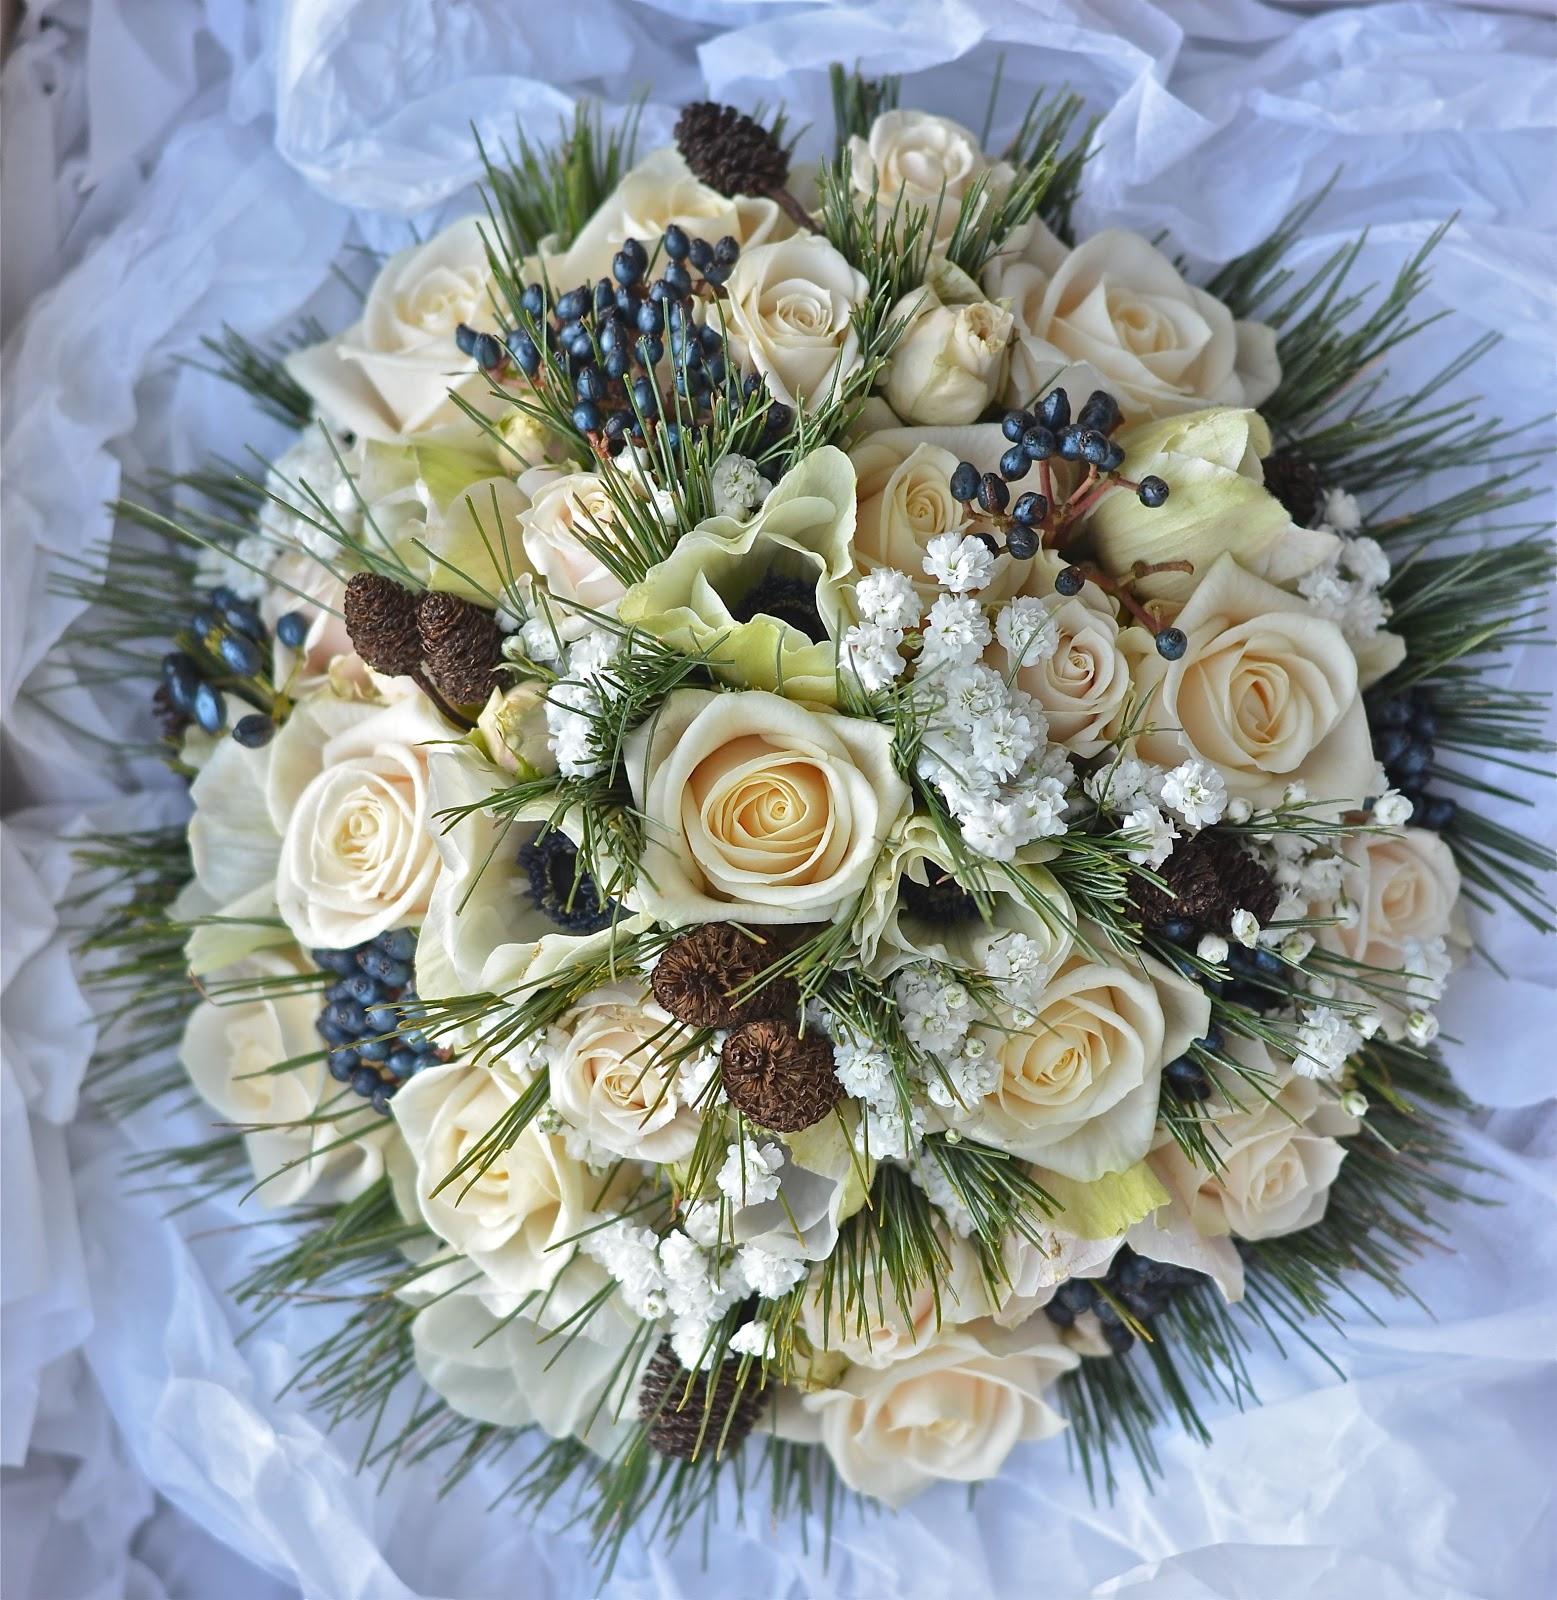 Wedding Flowers Blog: Lucy's Winter Wedding Flowers